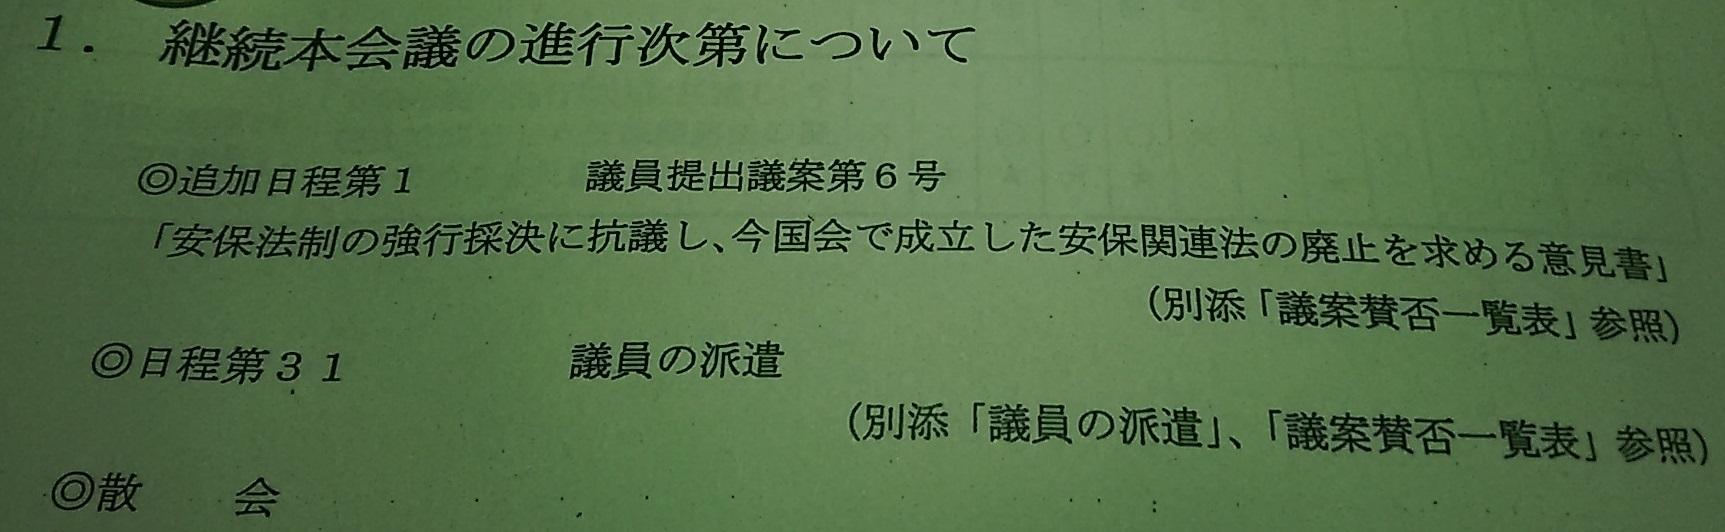 c0092197_2025377.jpg